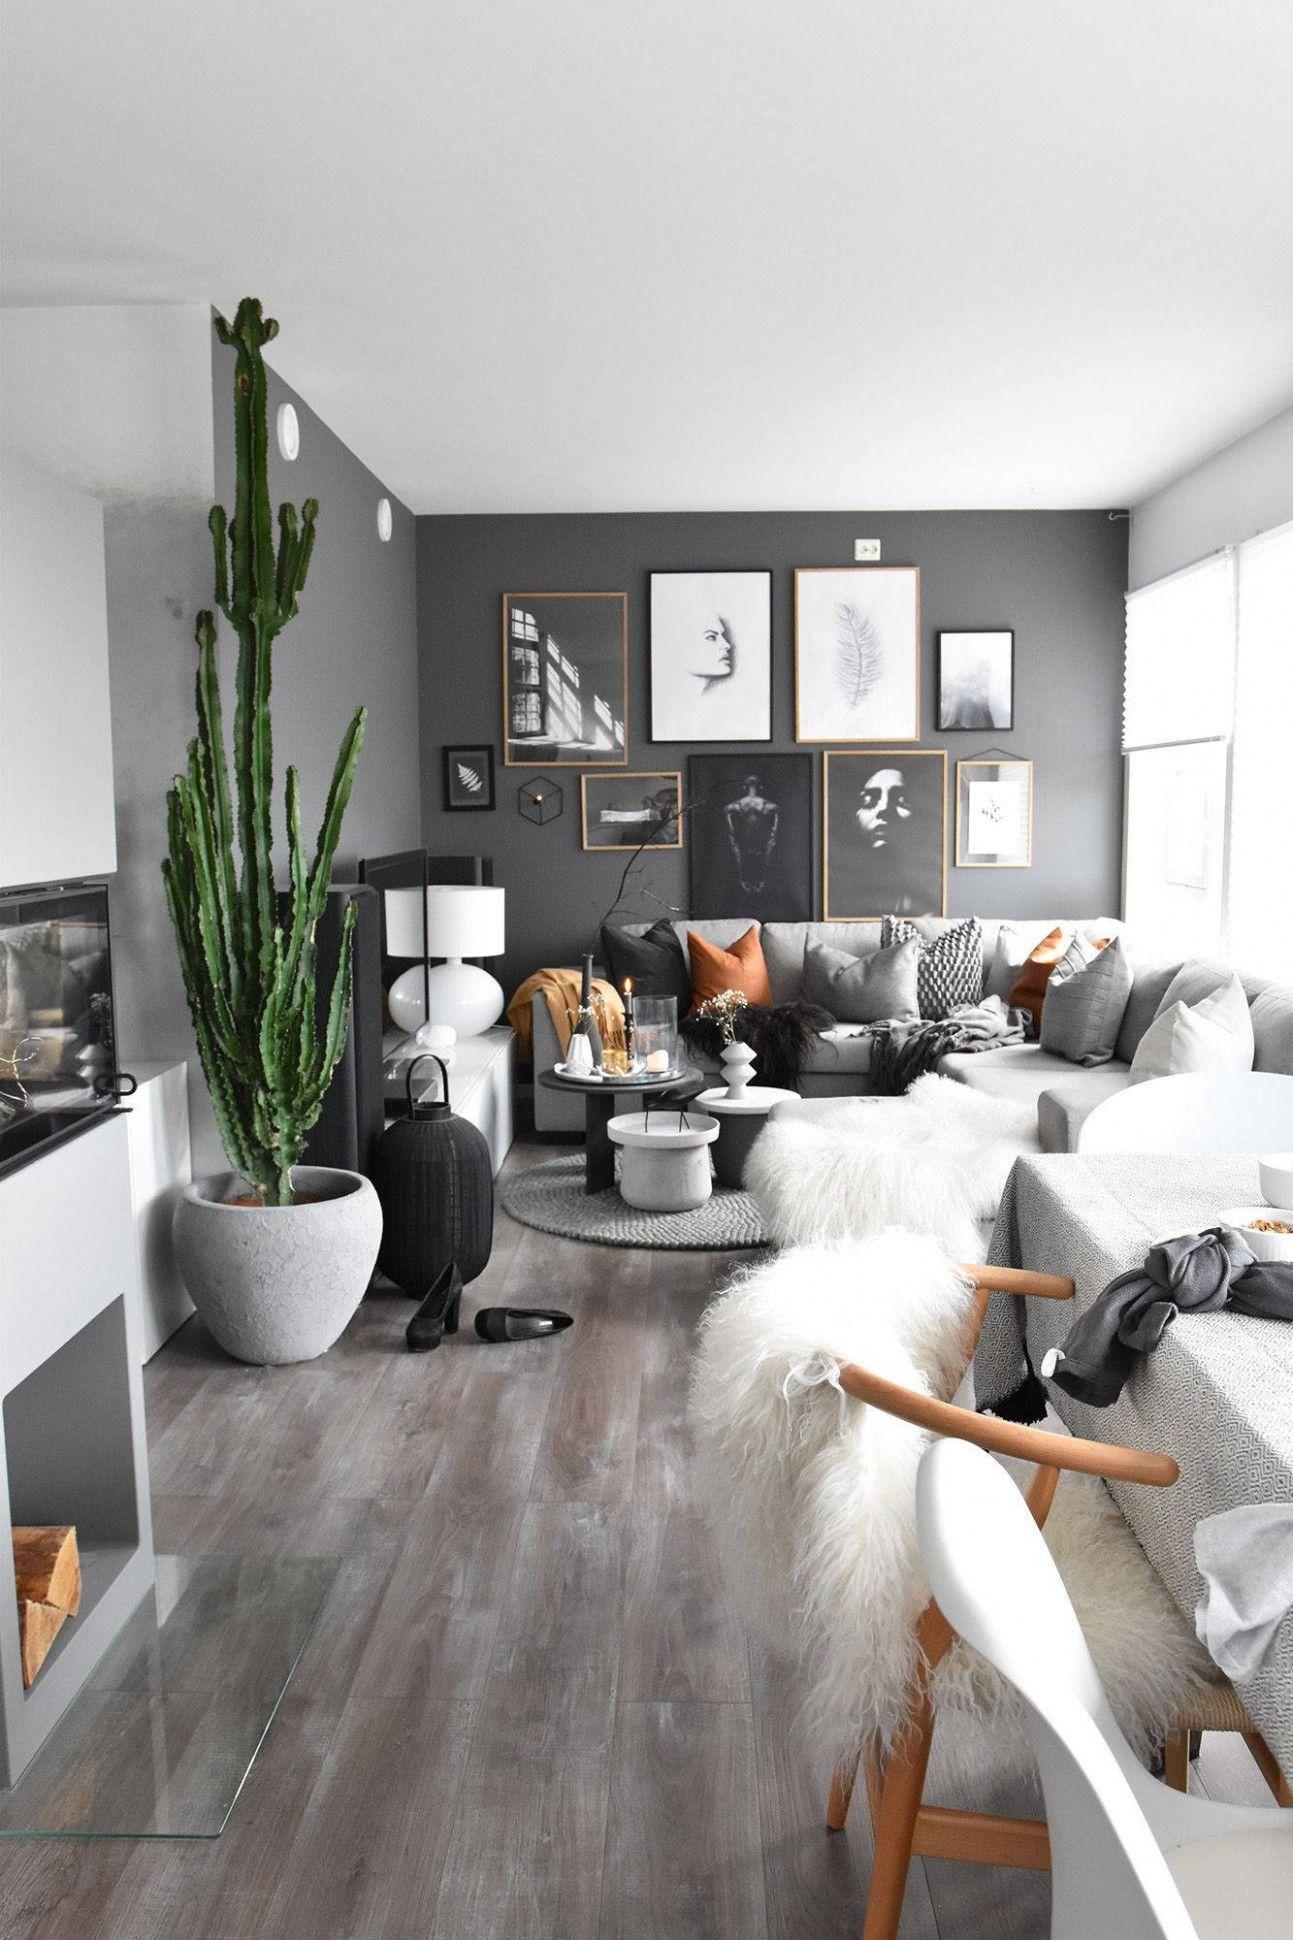 Exciting Grey Laminate Flooring Room Ideas Pictures Living Living Room Ideas Grey Floor In 2020 Living Room Grey Small Living Room Decor Yellow Decor Living Room